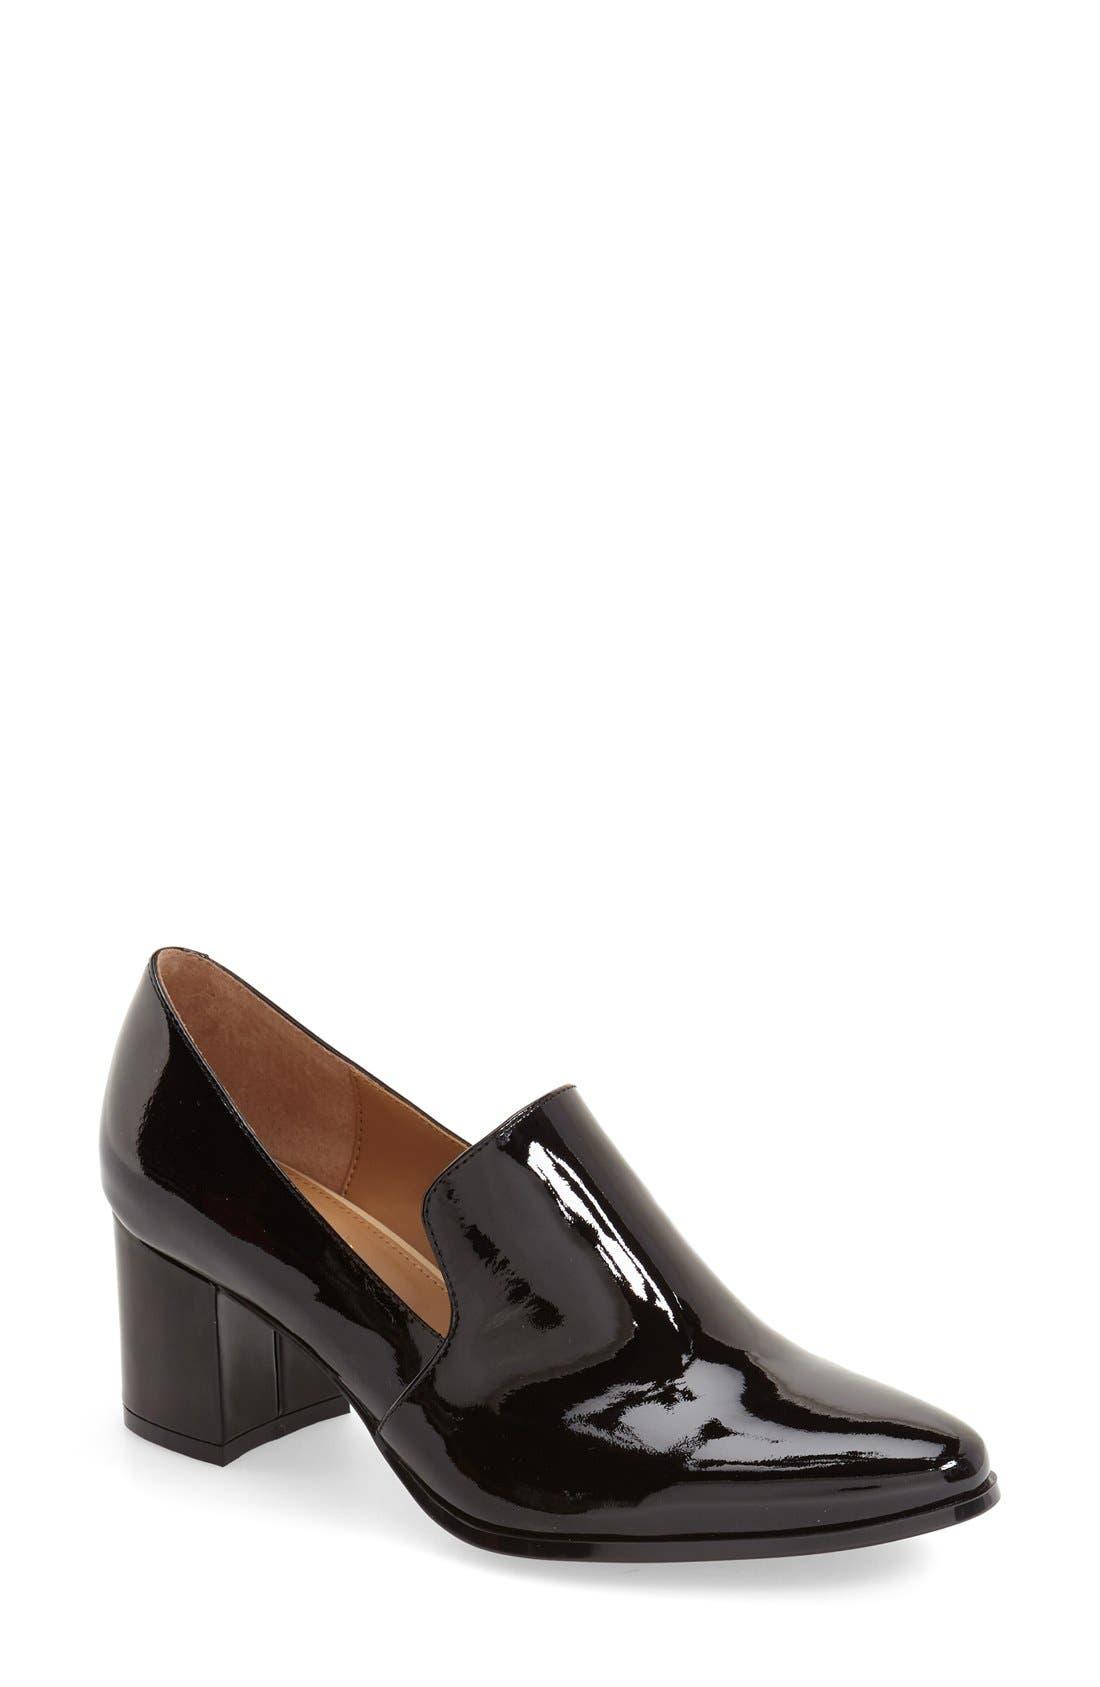 Alternate Image 1 Selected - Calvin Klein 'Faye' Block Heel Pump (Women)